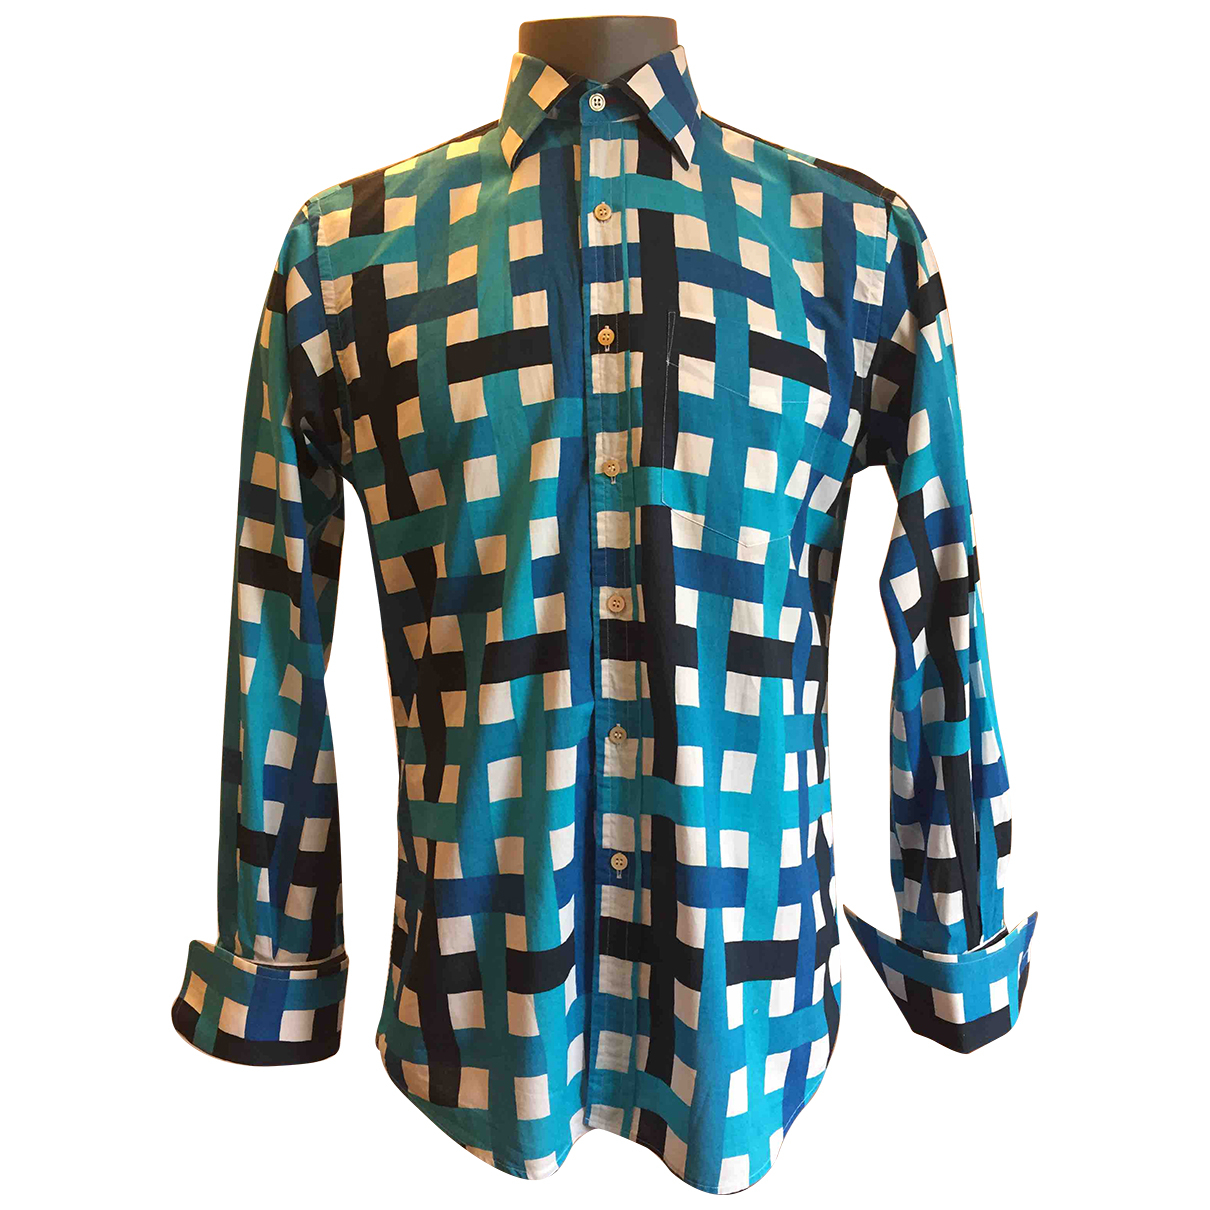 Paul Smith N Turquoise Cotton Shirts for Men 15.5 UK - US (tour de cou / collar)